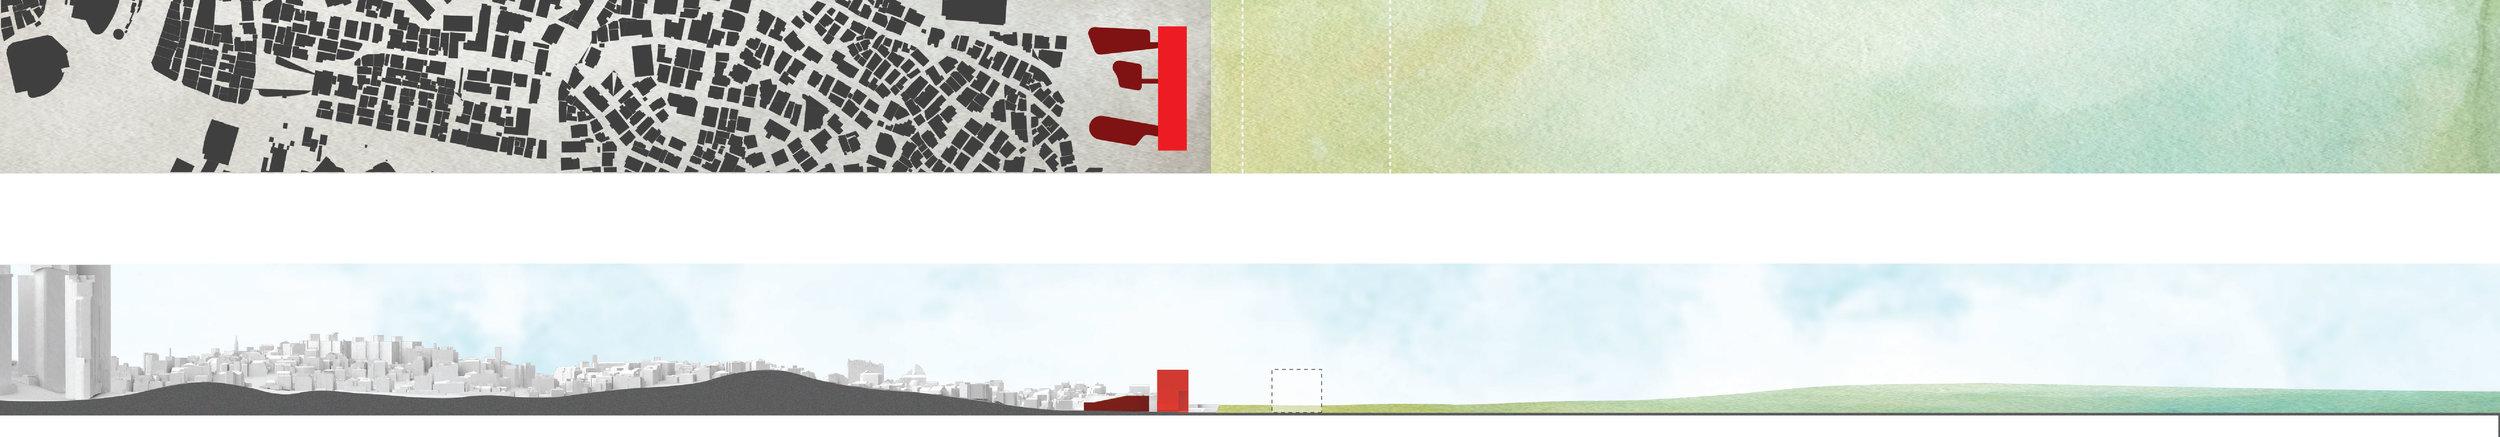 20180702_Long Concept Diagram2.jpg